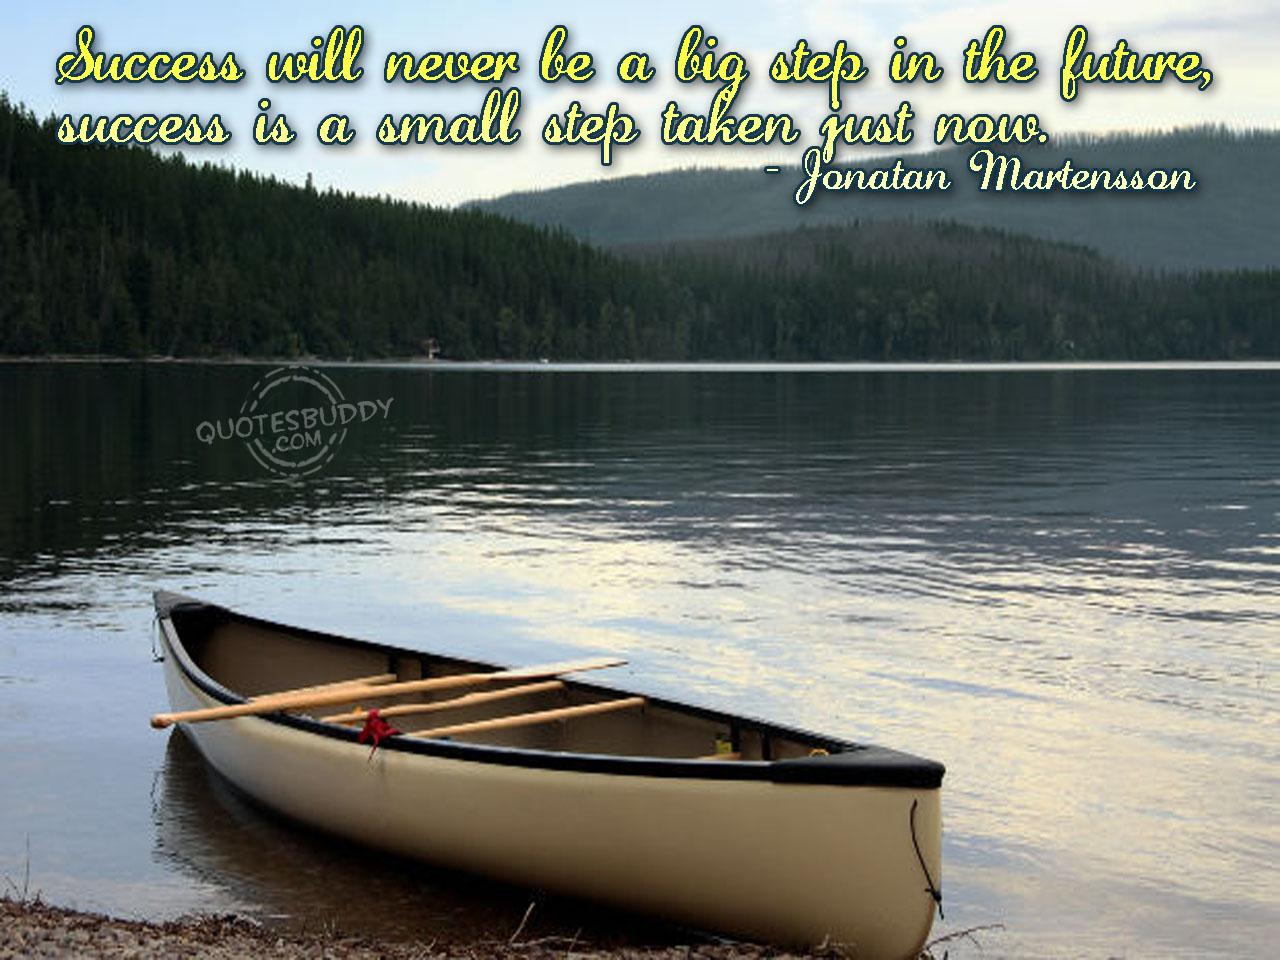 Motivational Wallpaper on Success: Success will never be a big step